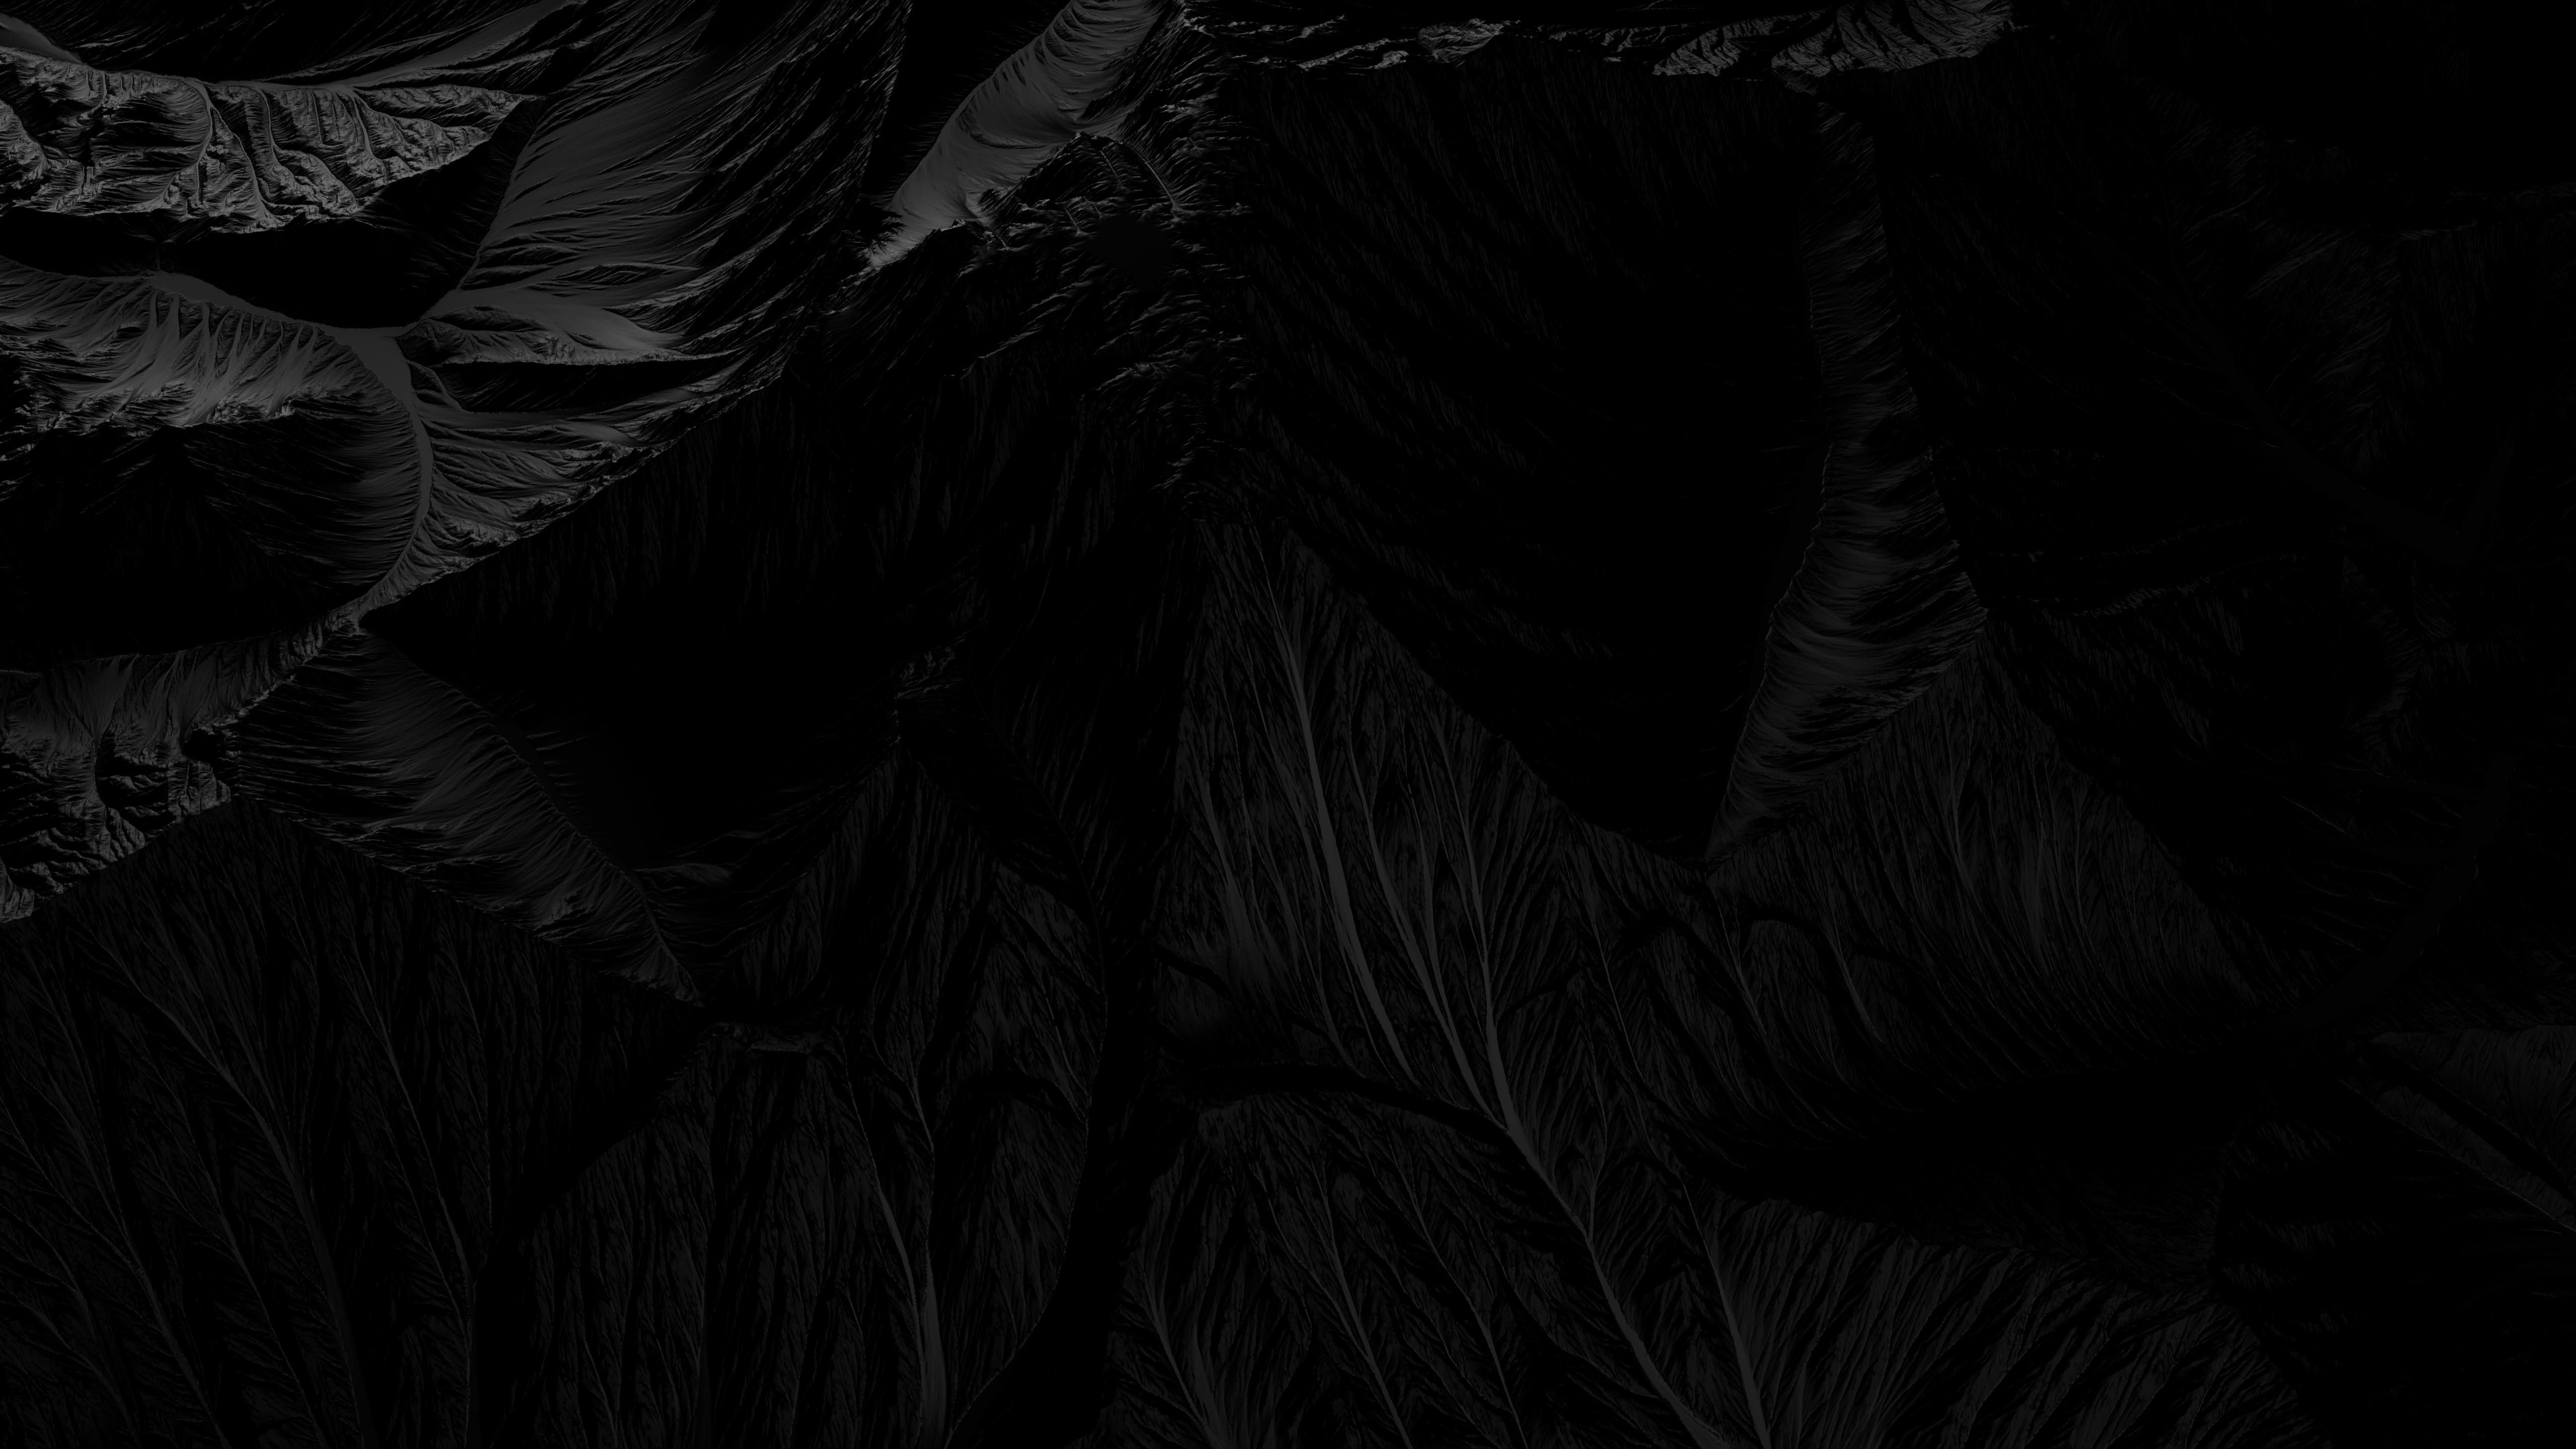 3595a48d833 Black Wallpaper Collection From Jean-Marc Denis – MinimalSetups